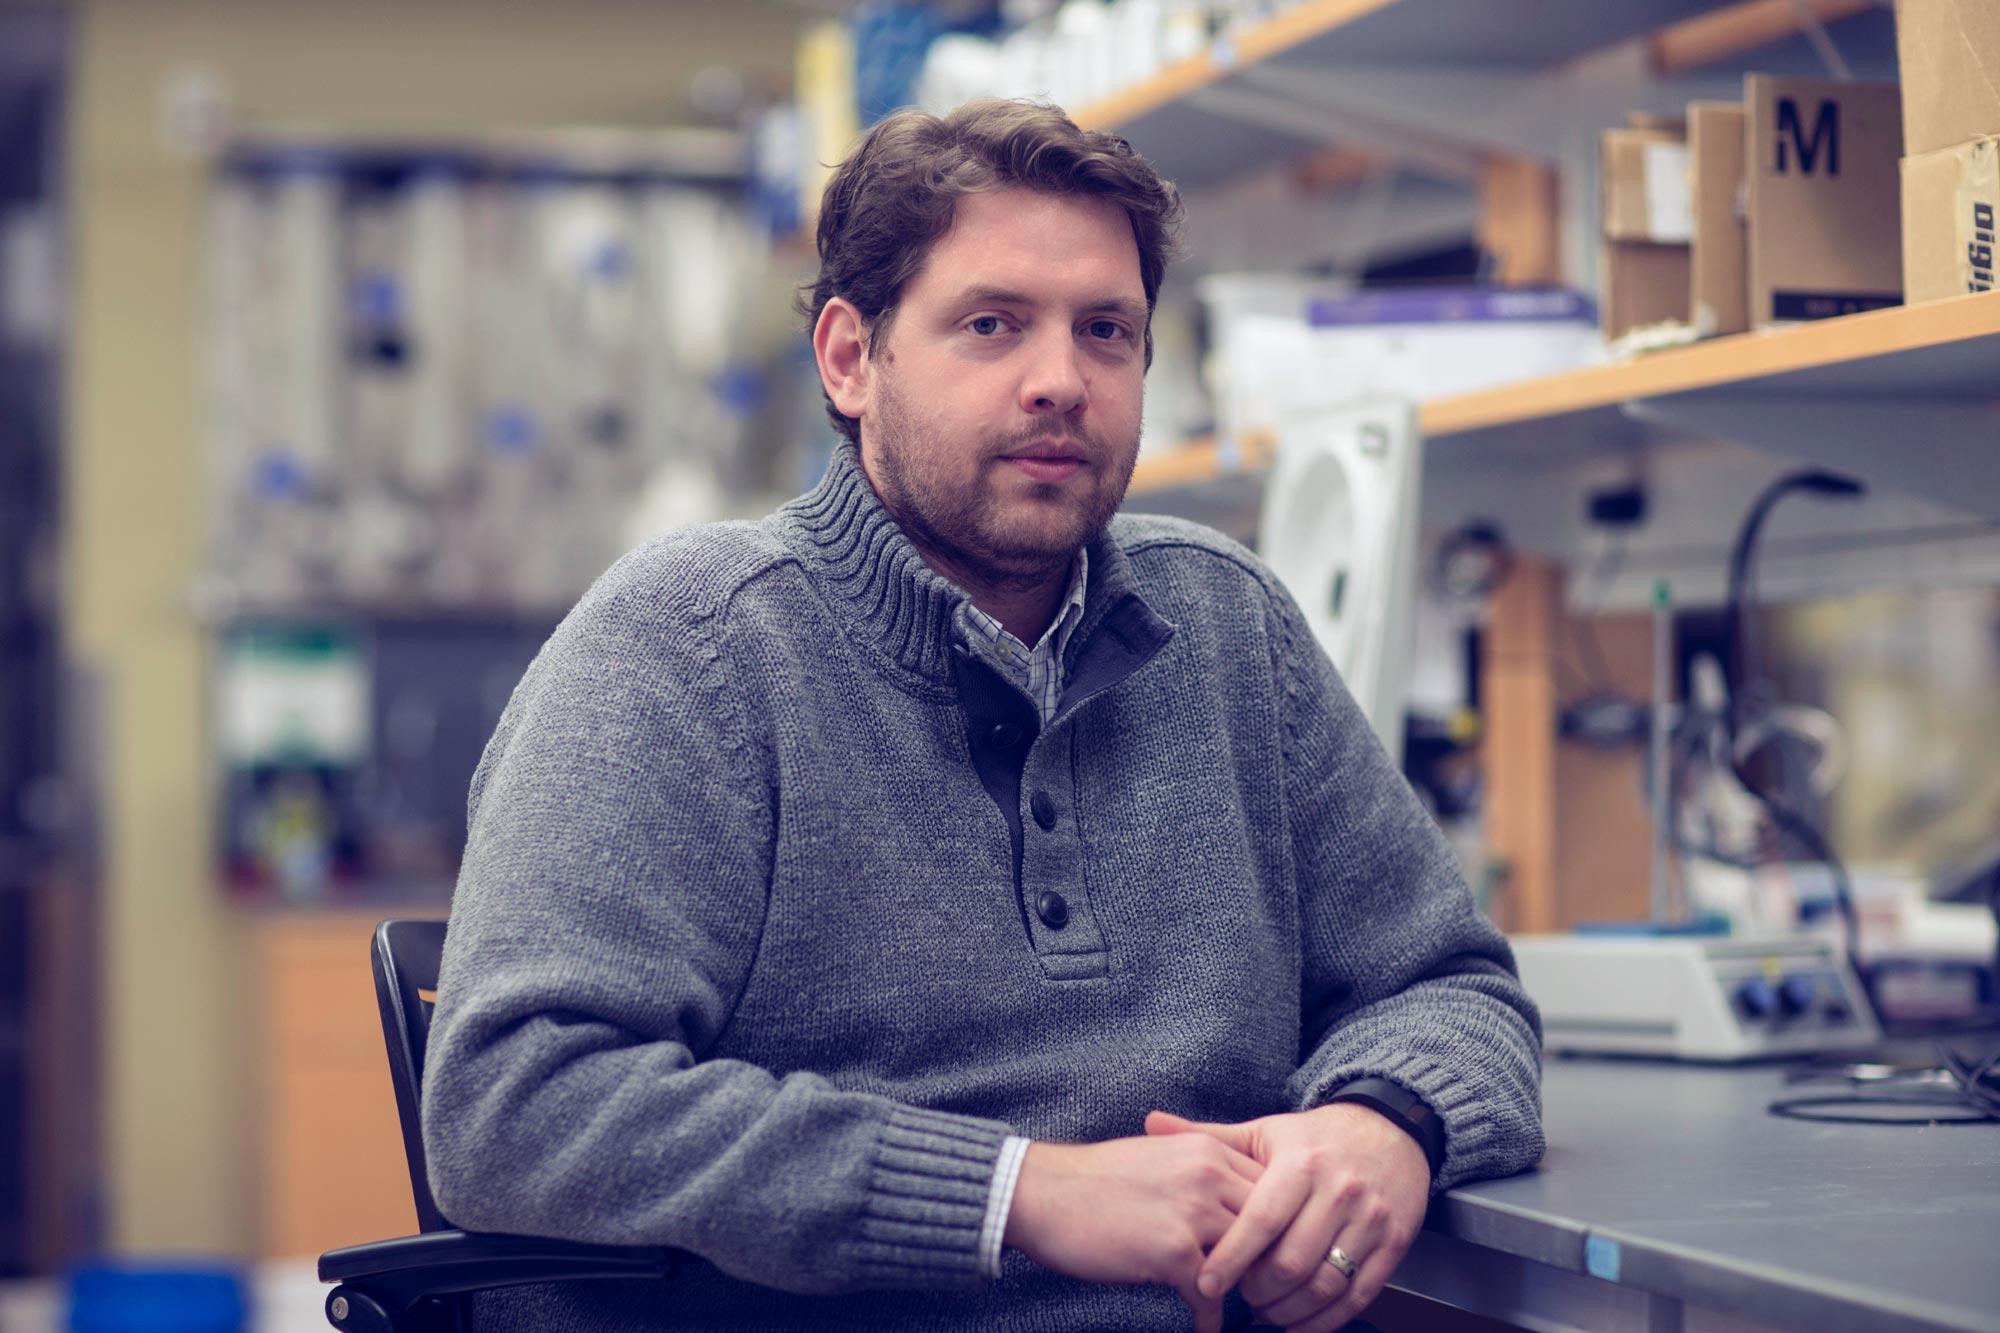 Biologist Ali Deniz Güler focuses on identifying neural circuits governing biological rhythms, providing therapeutic targets for diseases.